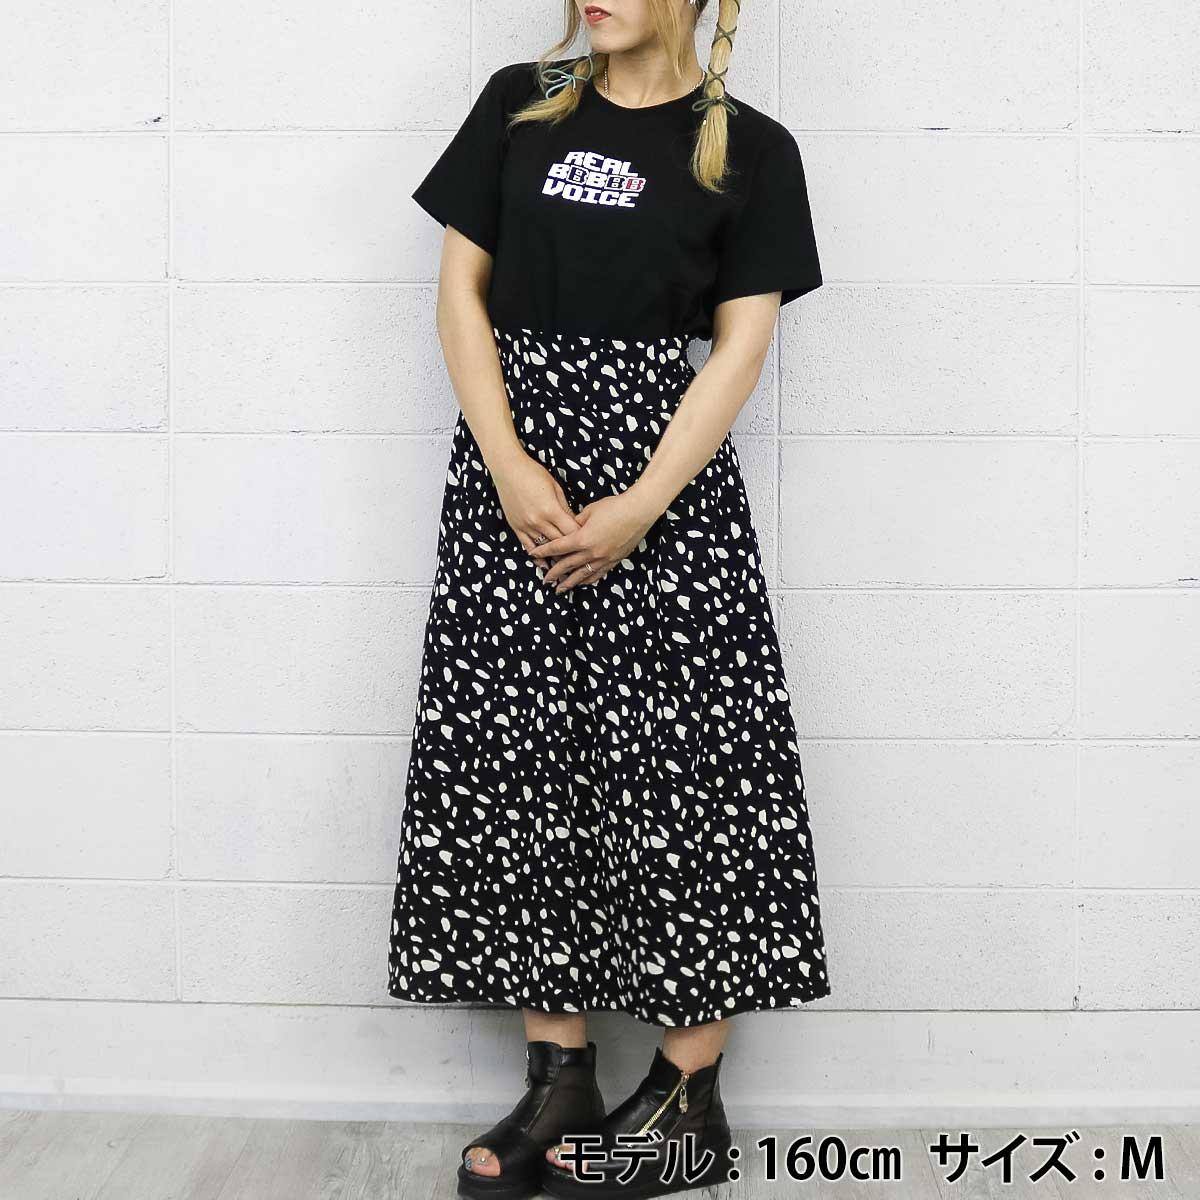 WOMEN'S 8bit LOGO T-SHIRT